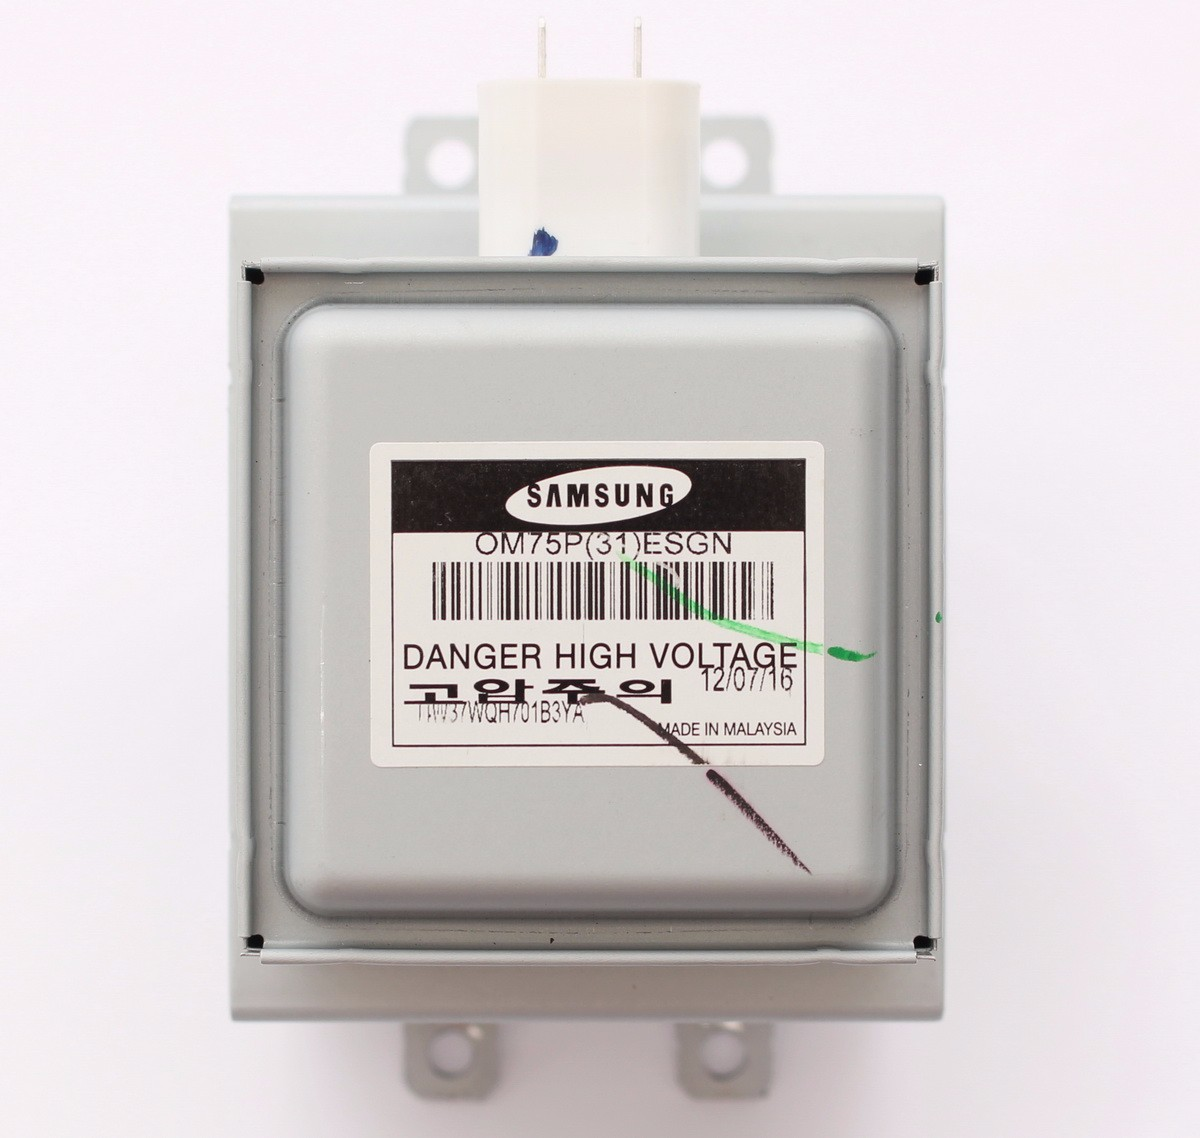 Original OEM Genuine Samsung OM75P ESGN Magnetron From MS14K6000AG Microwave 31